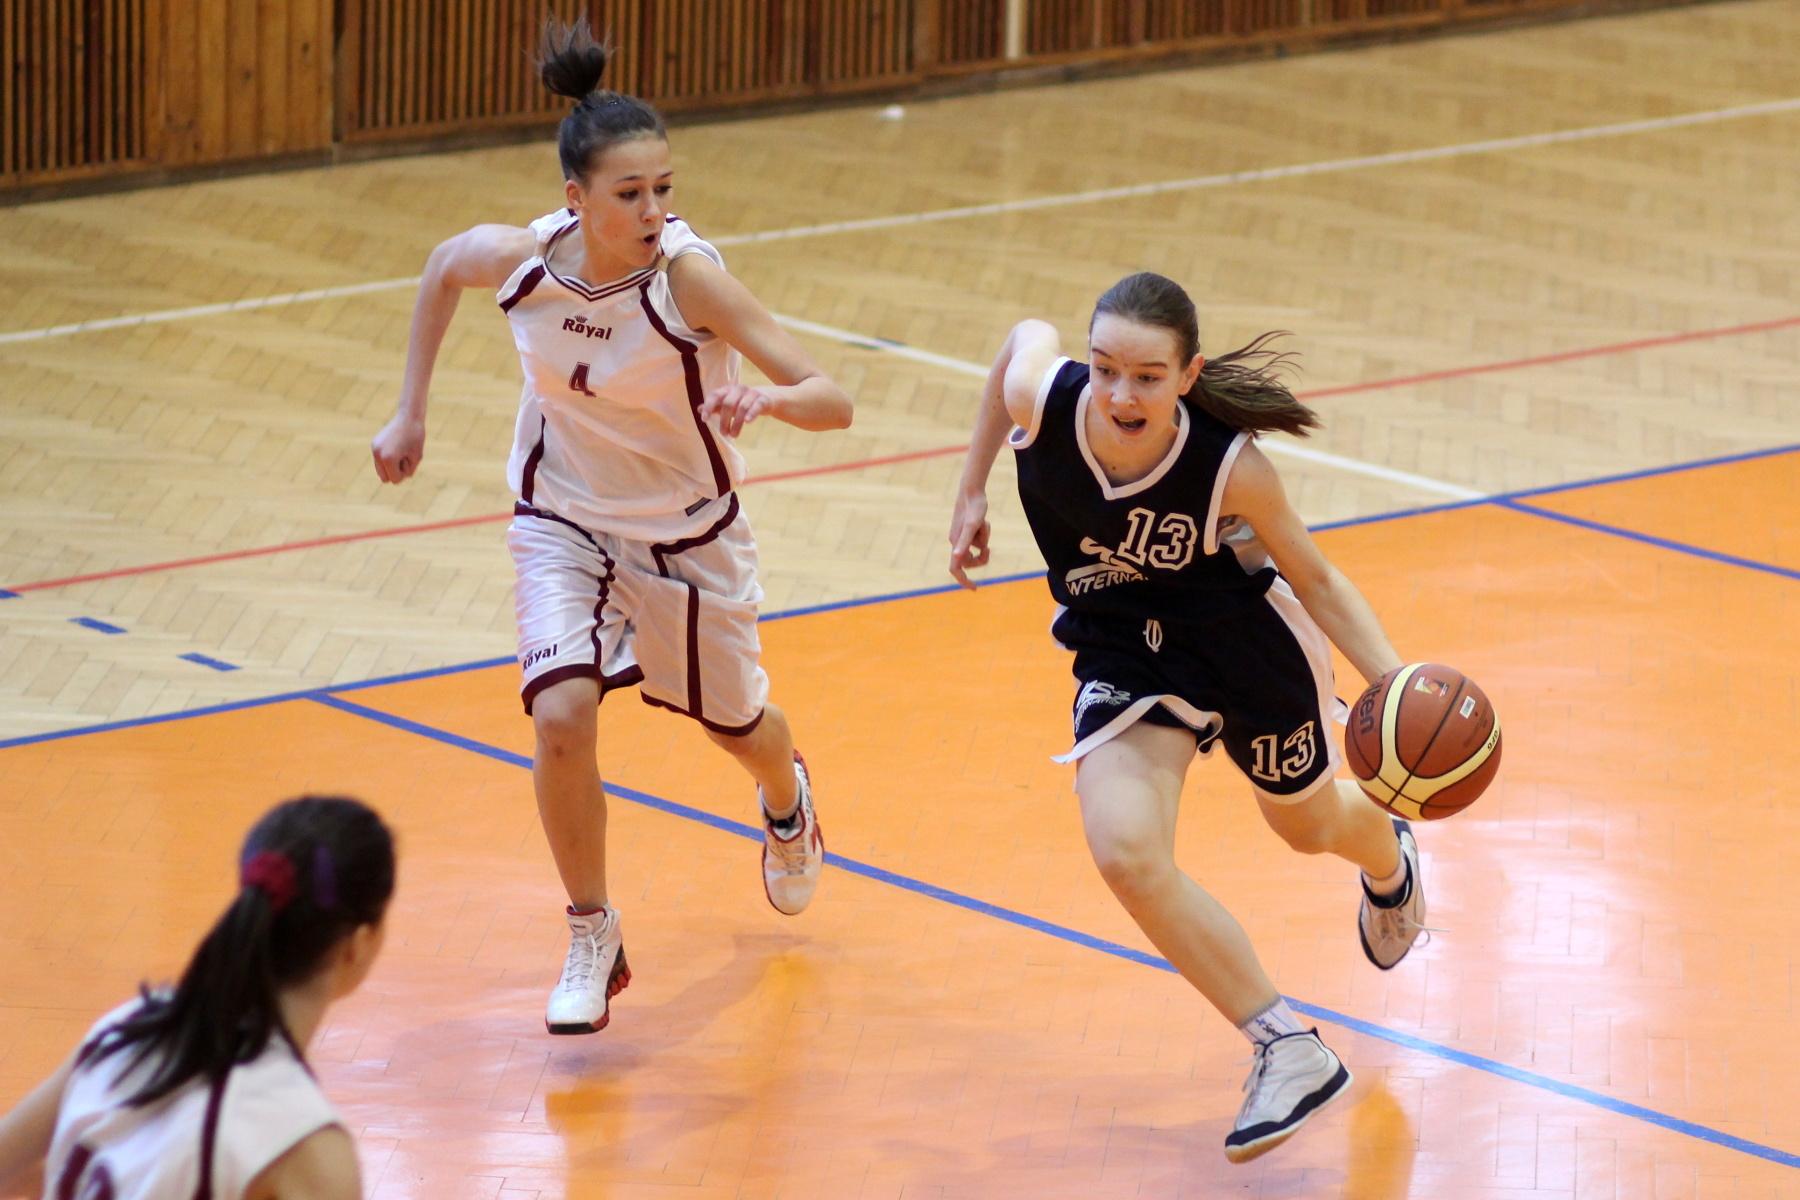 bk-zvolen-bk-petrzalka-ziacky-basketbal-2